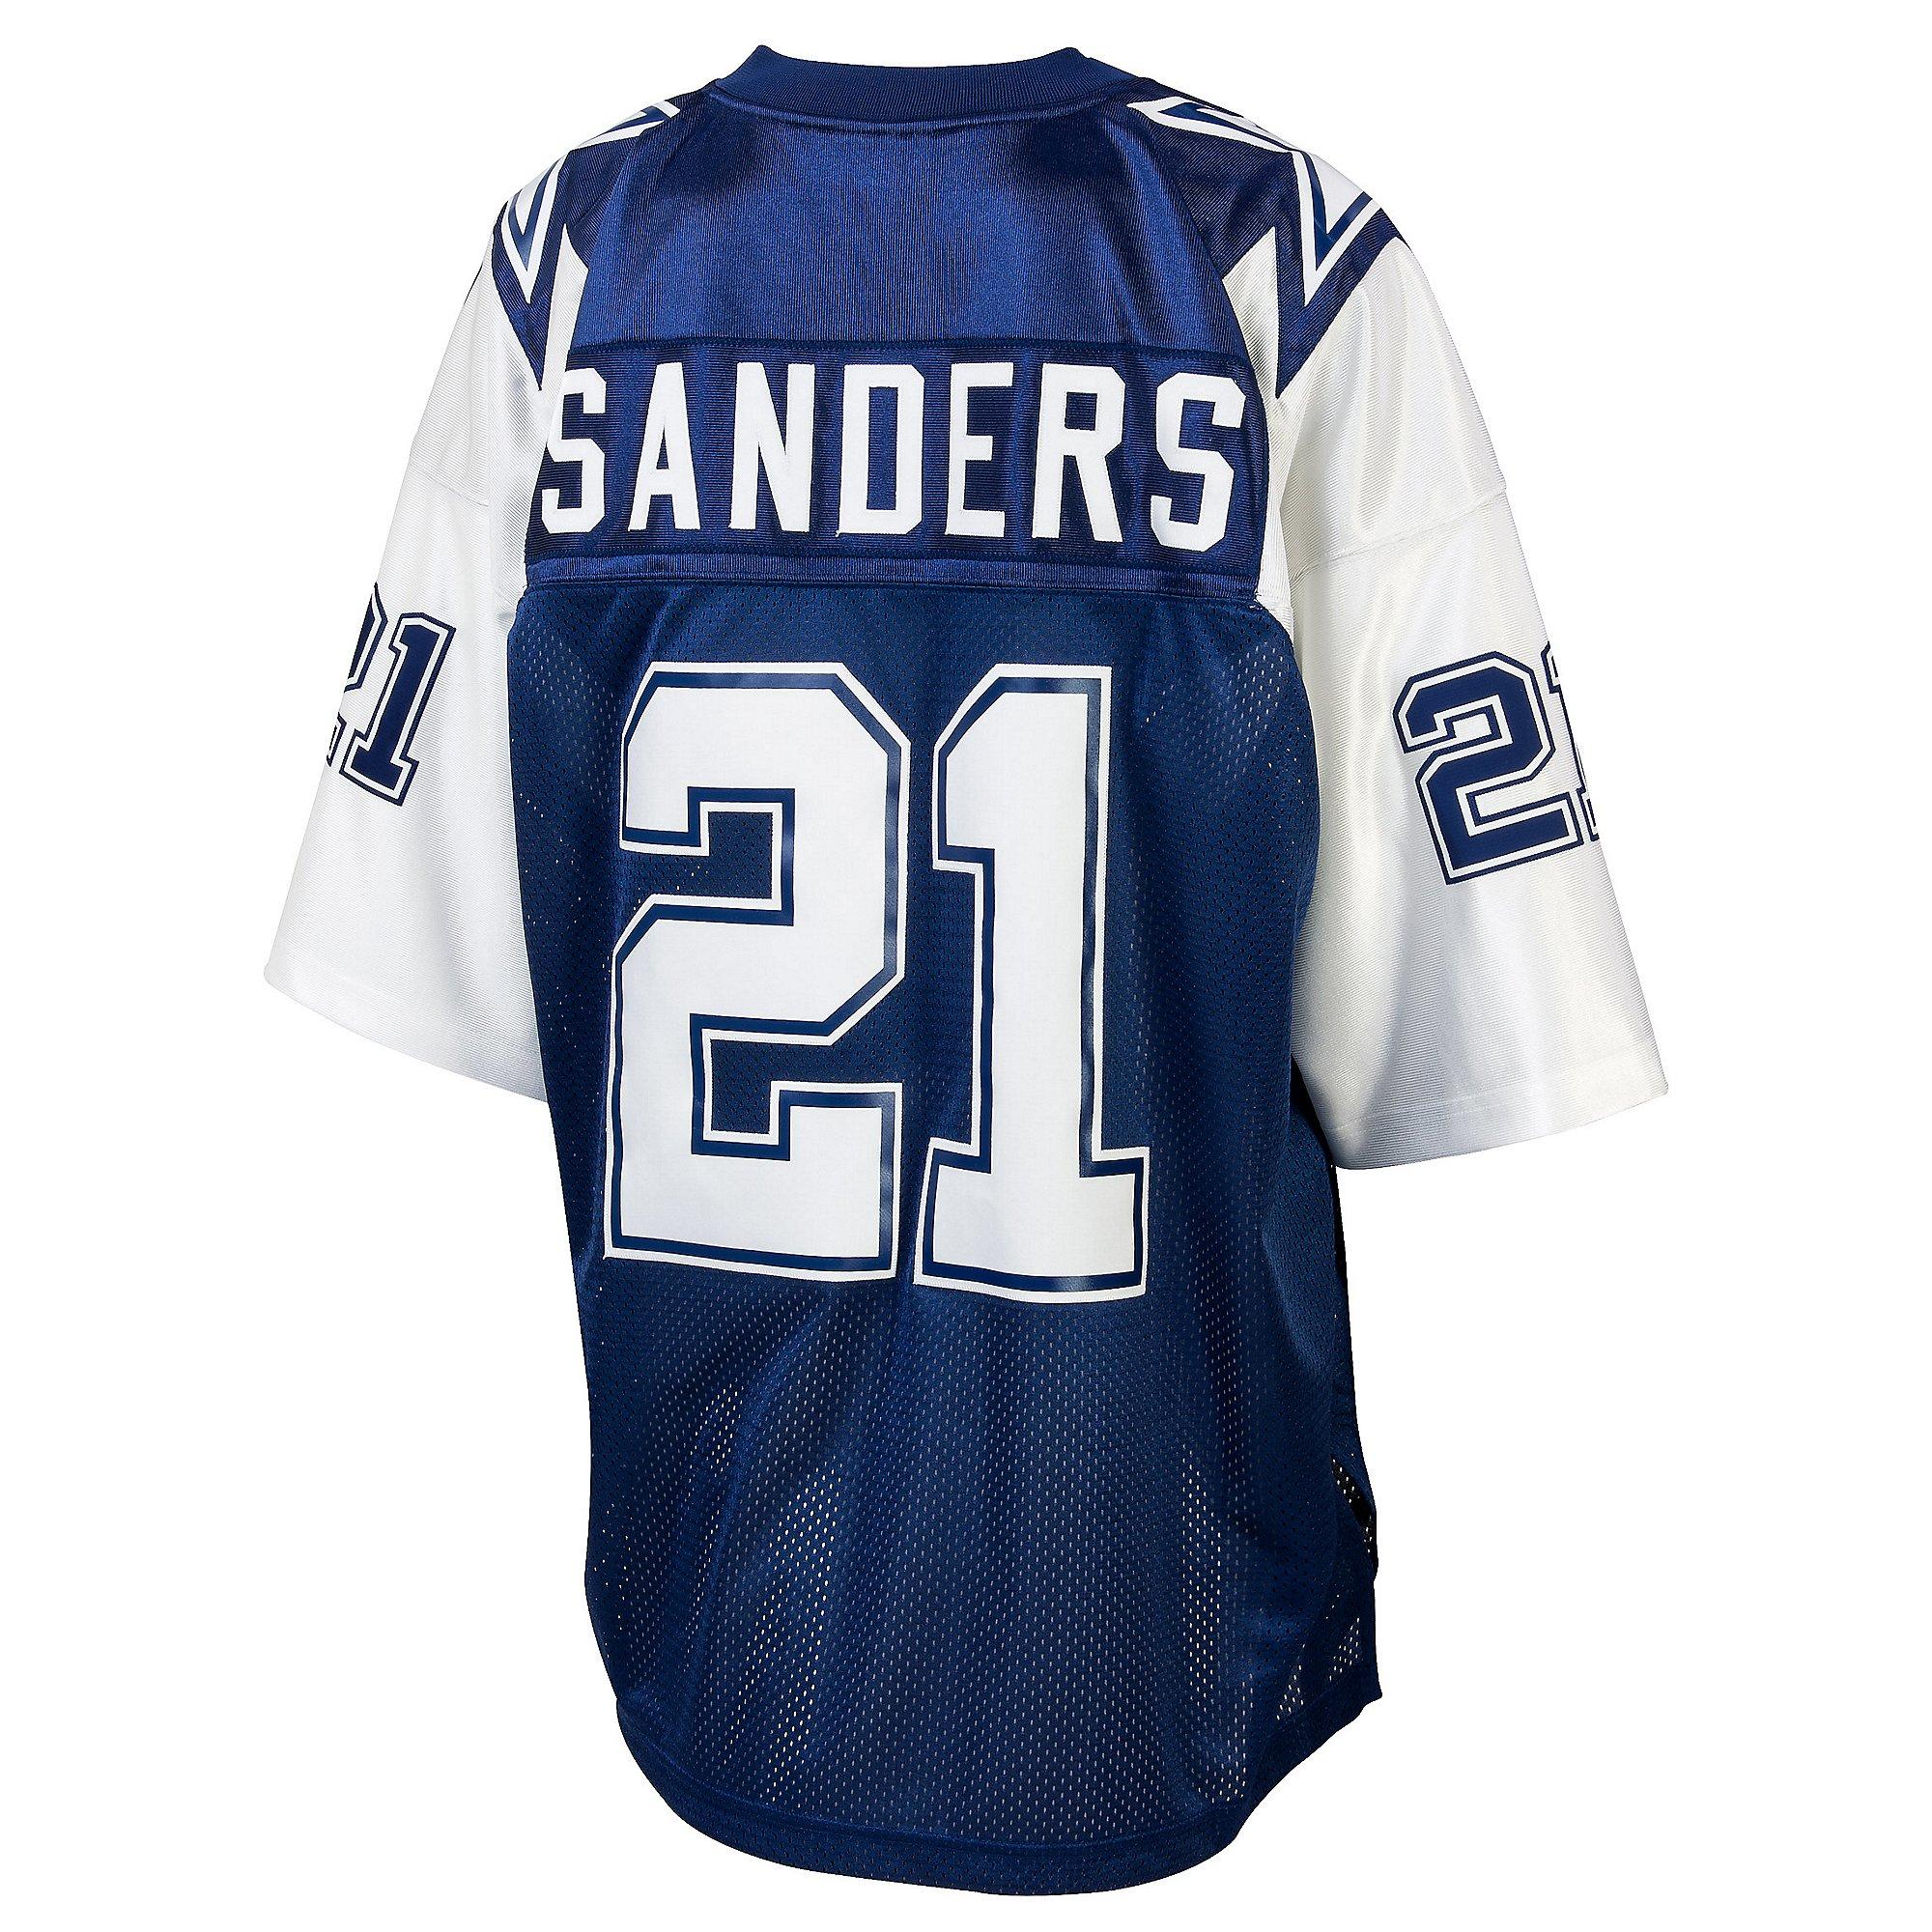 Dallas Cowboys Deion Sanders #21 1995 Authentic Double Star Jersey ...